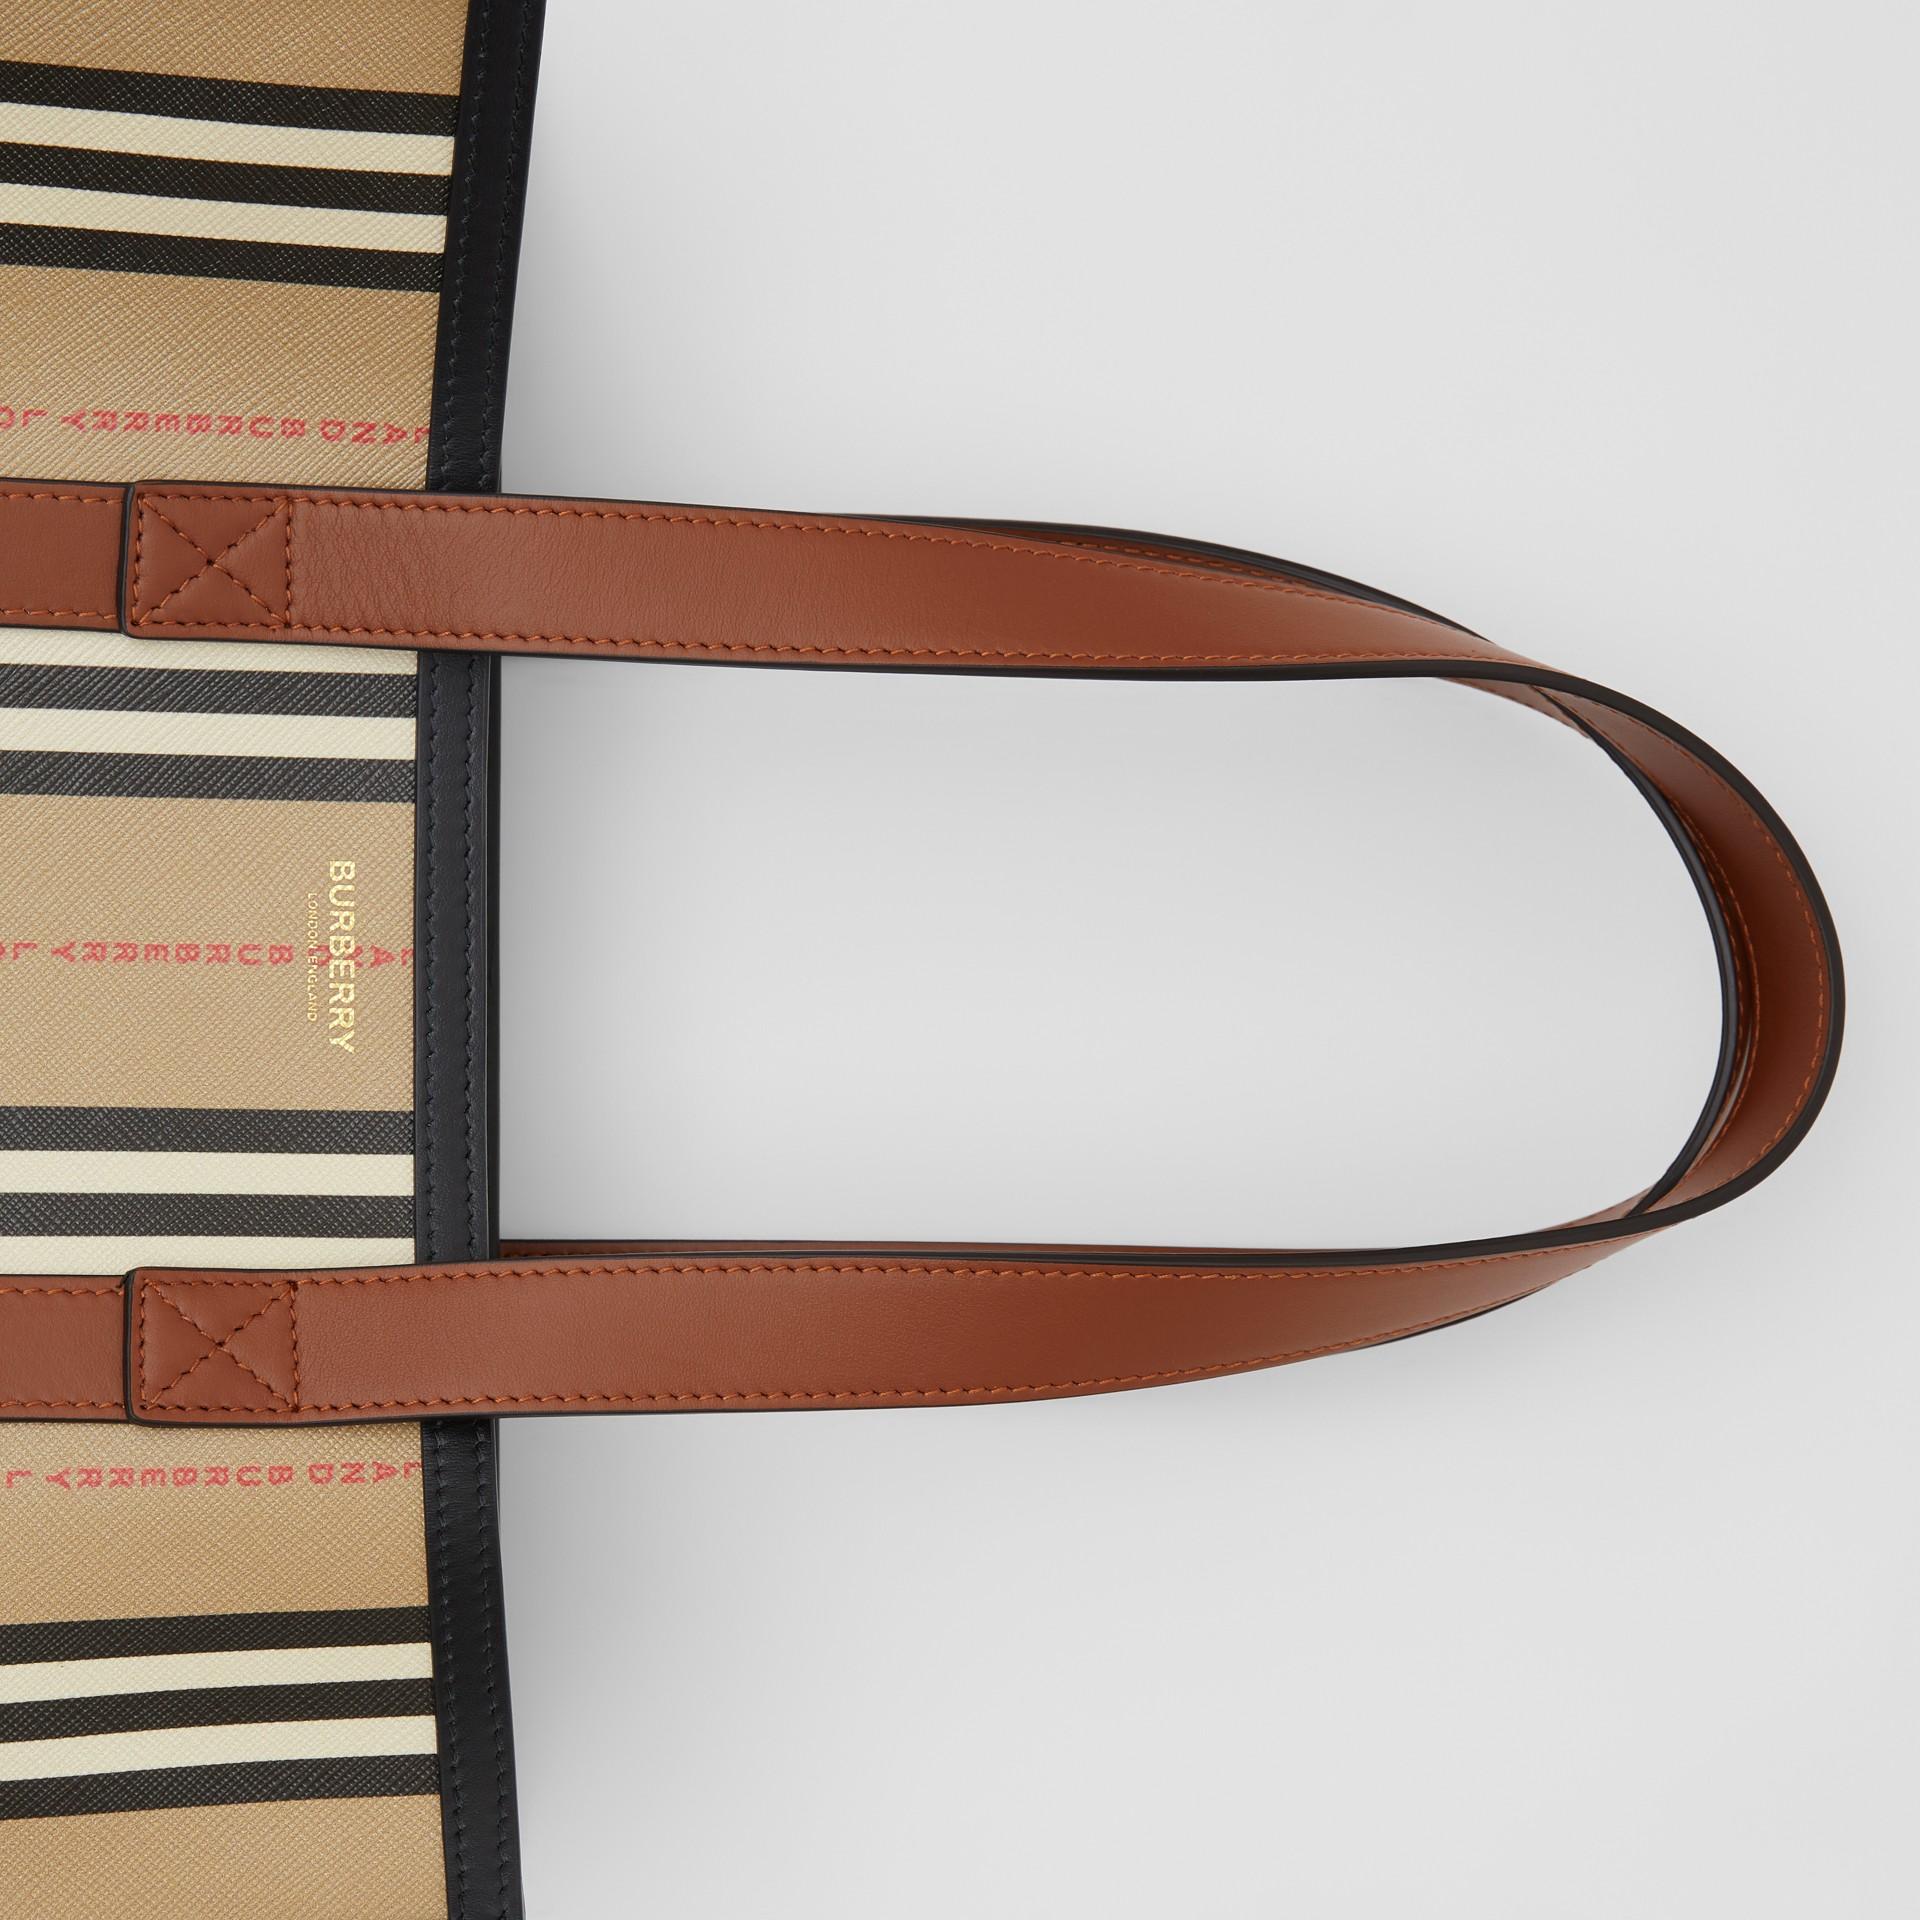 Logo and Stripe E-canvas Portrait Tote Bag in Tan/archive Beige - Women | Burberry - gallery image 1